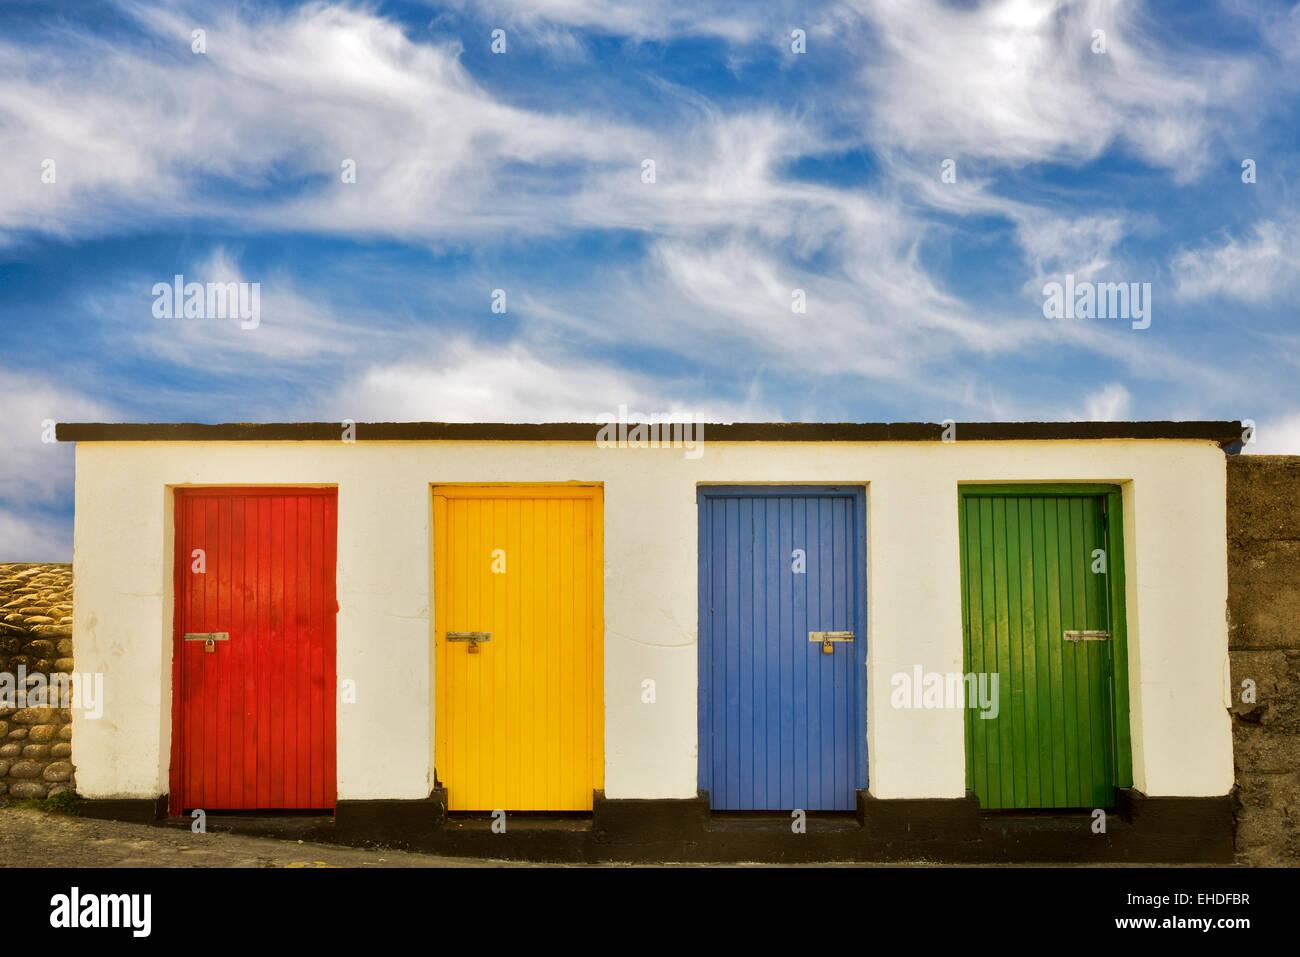 Colored doors. Inishfree Pier, Ennicrone, Ireland - Stock Image